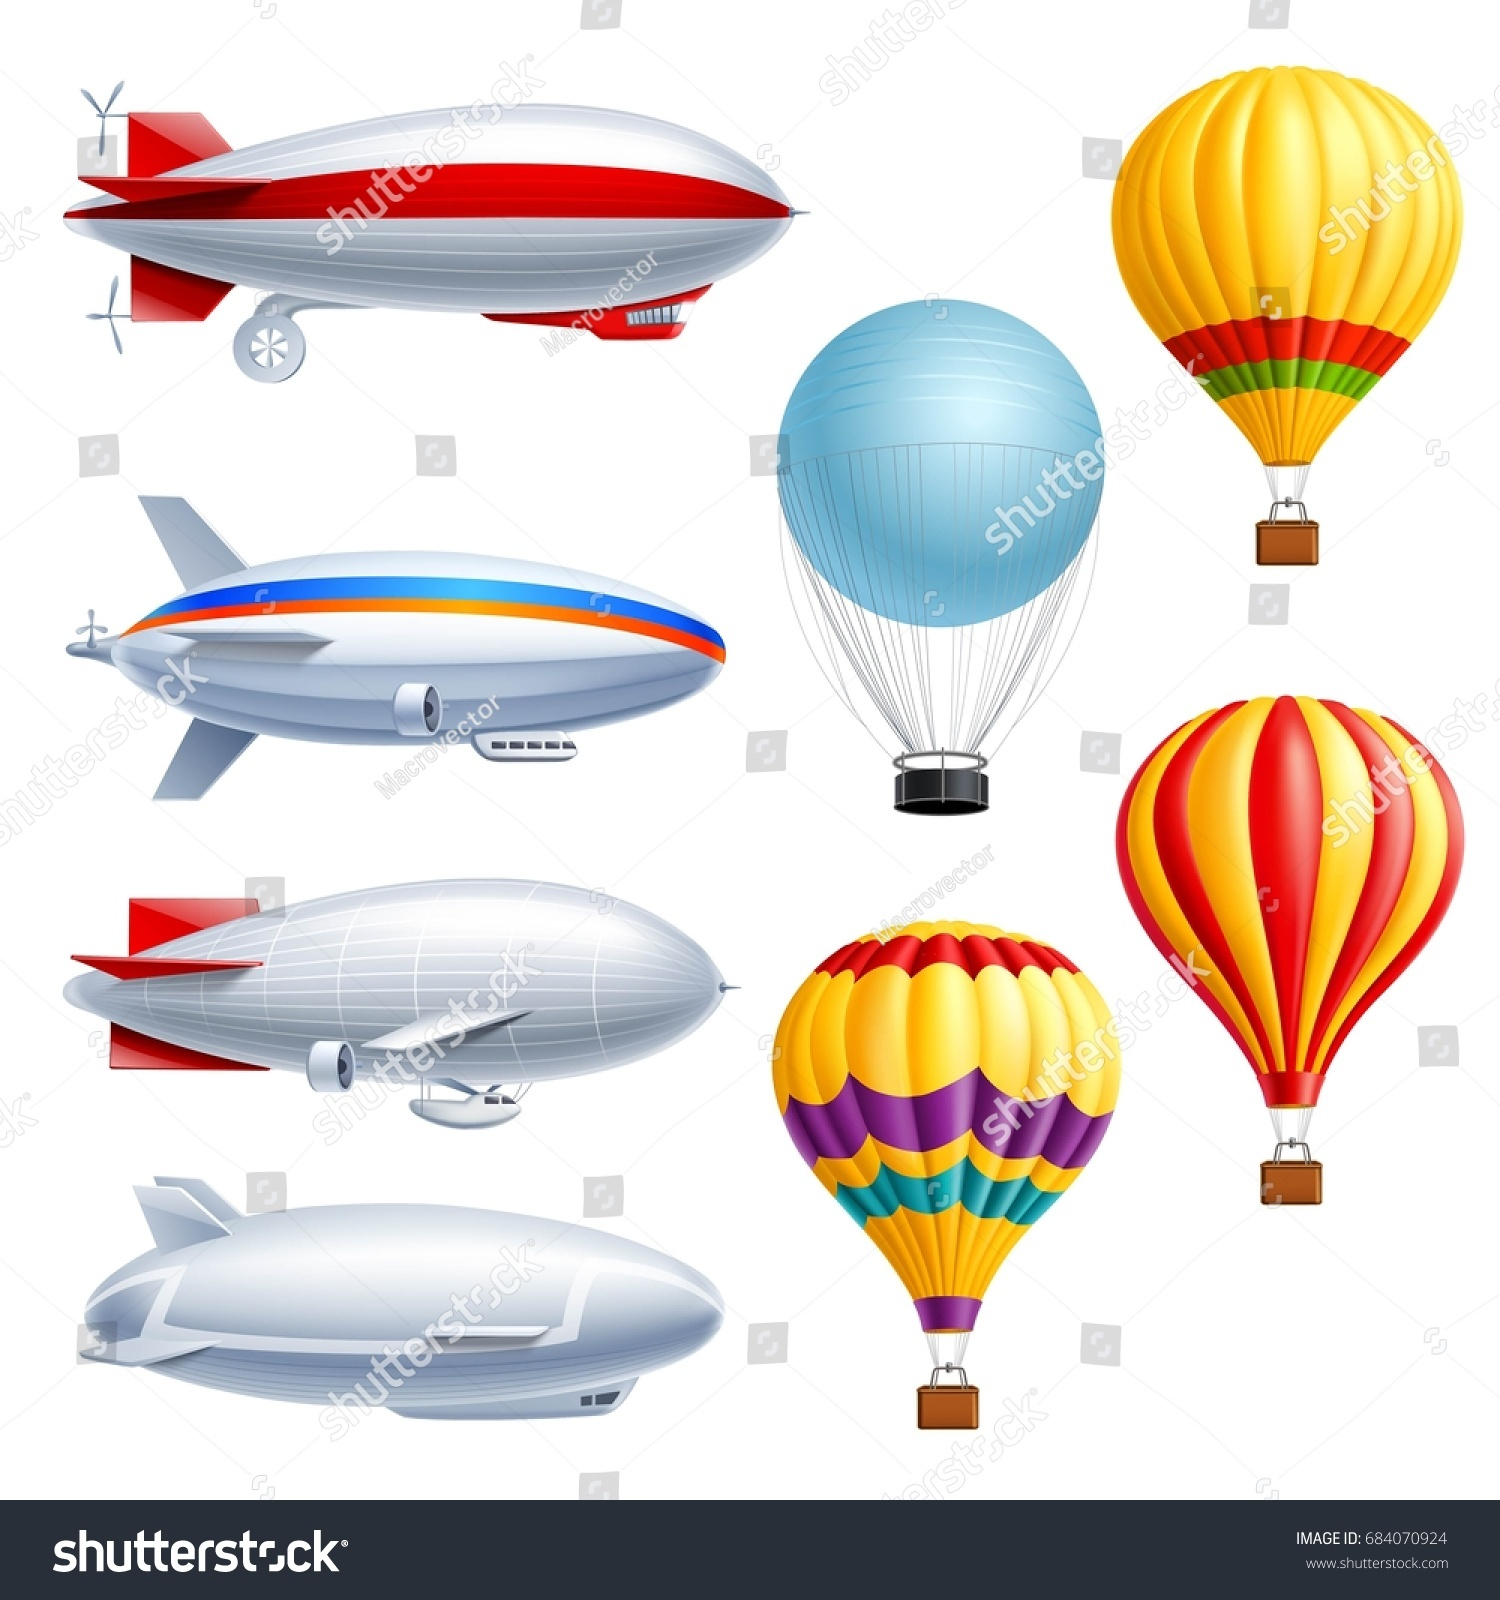 Decorative Air Balloons